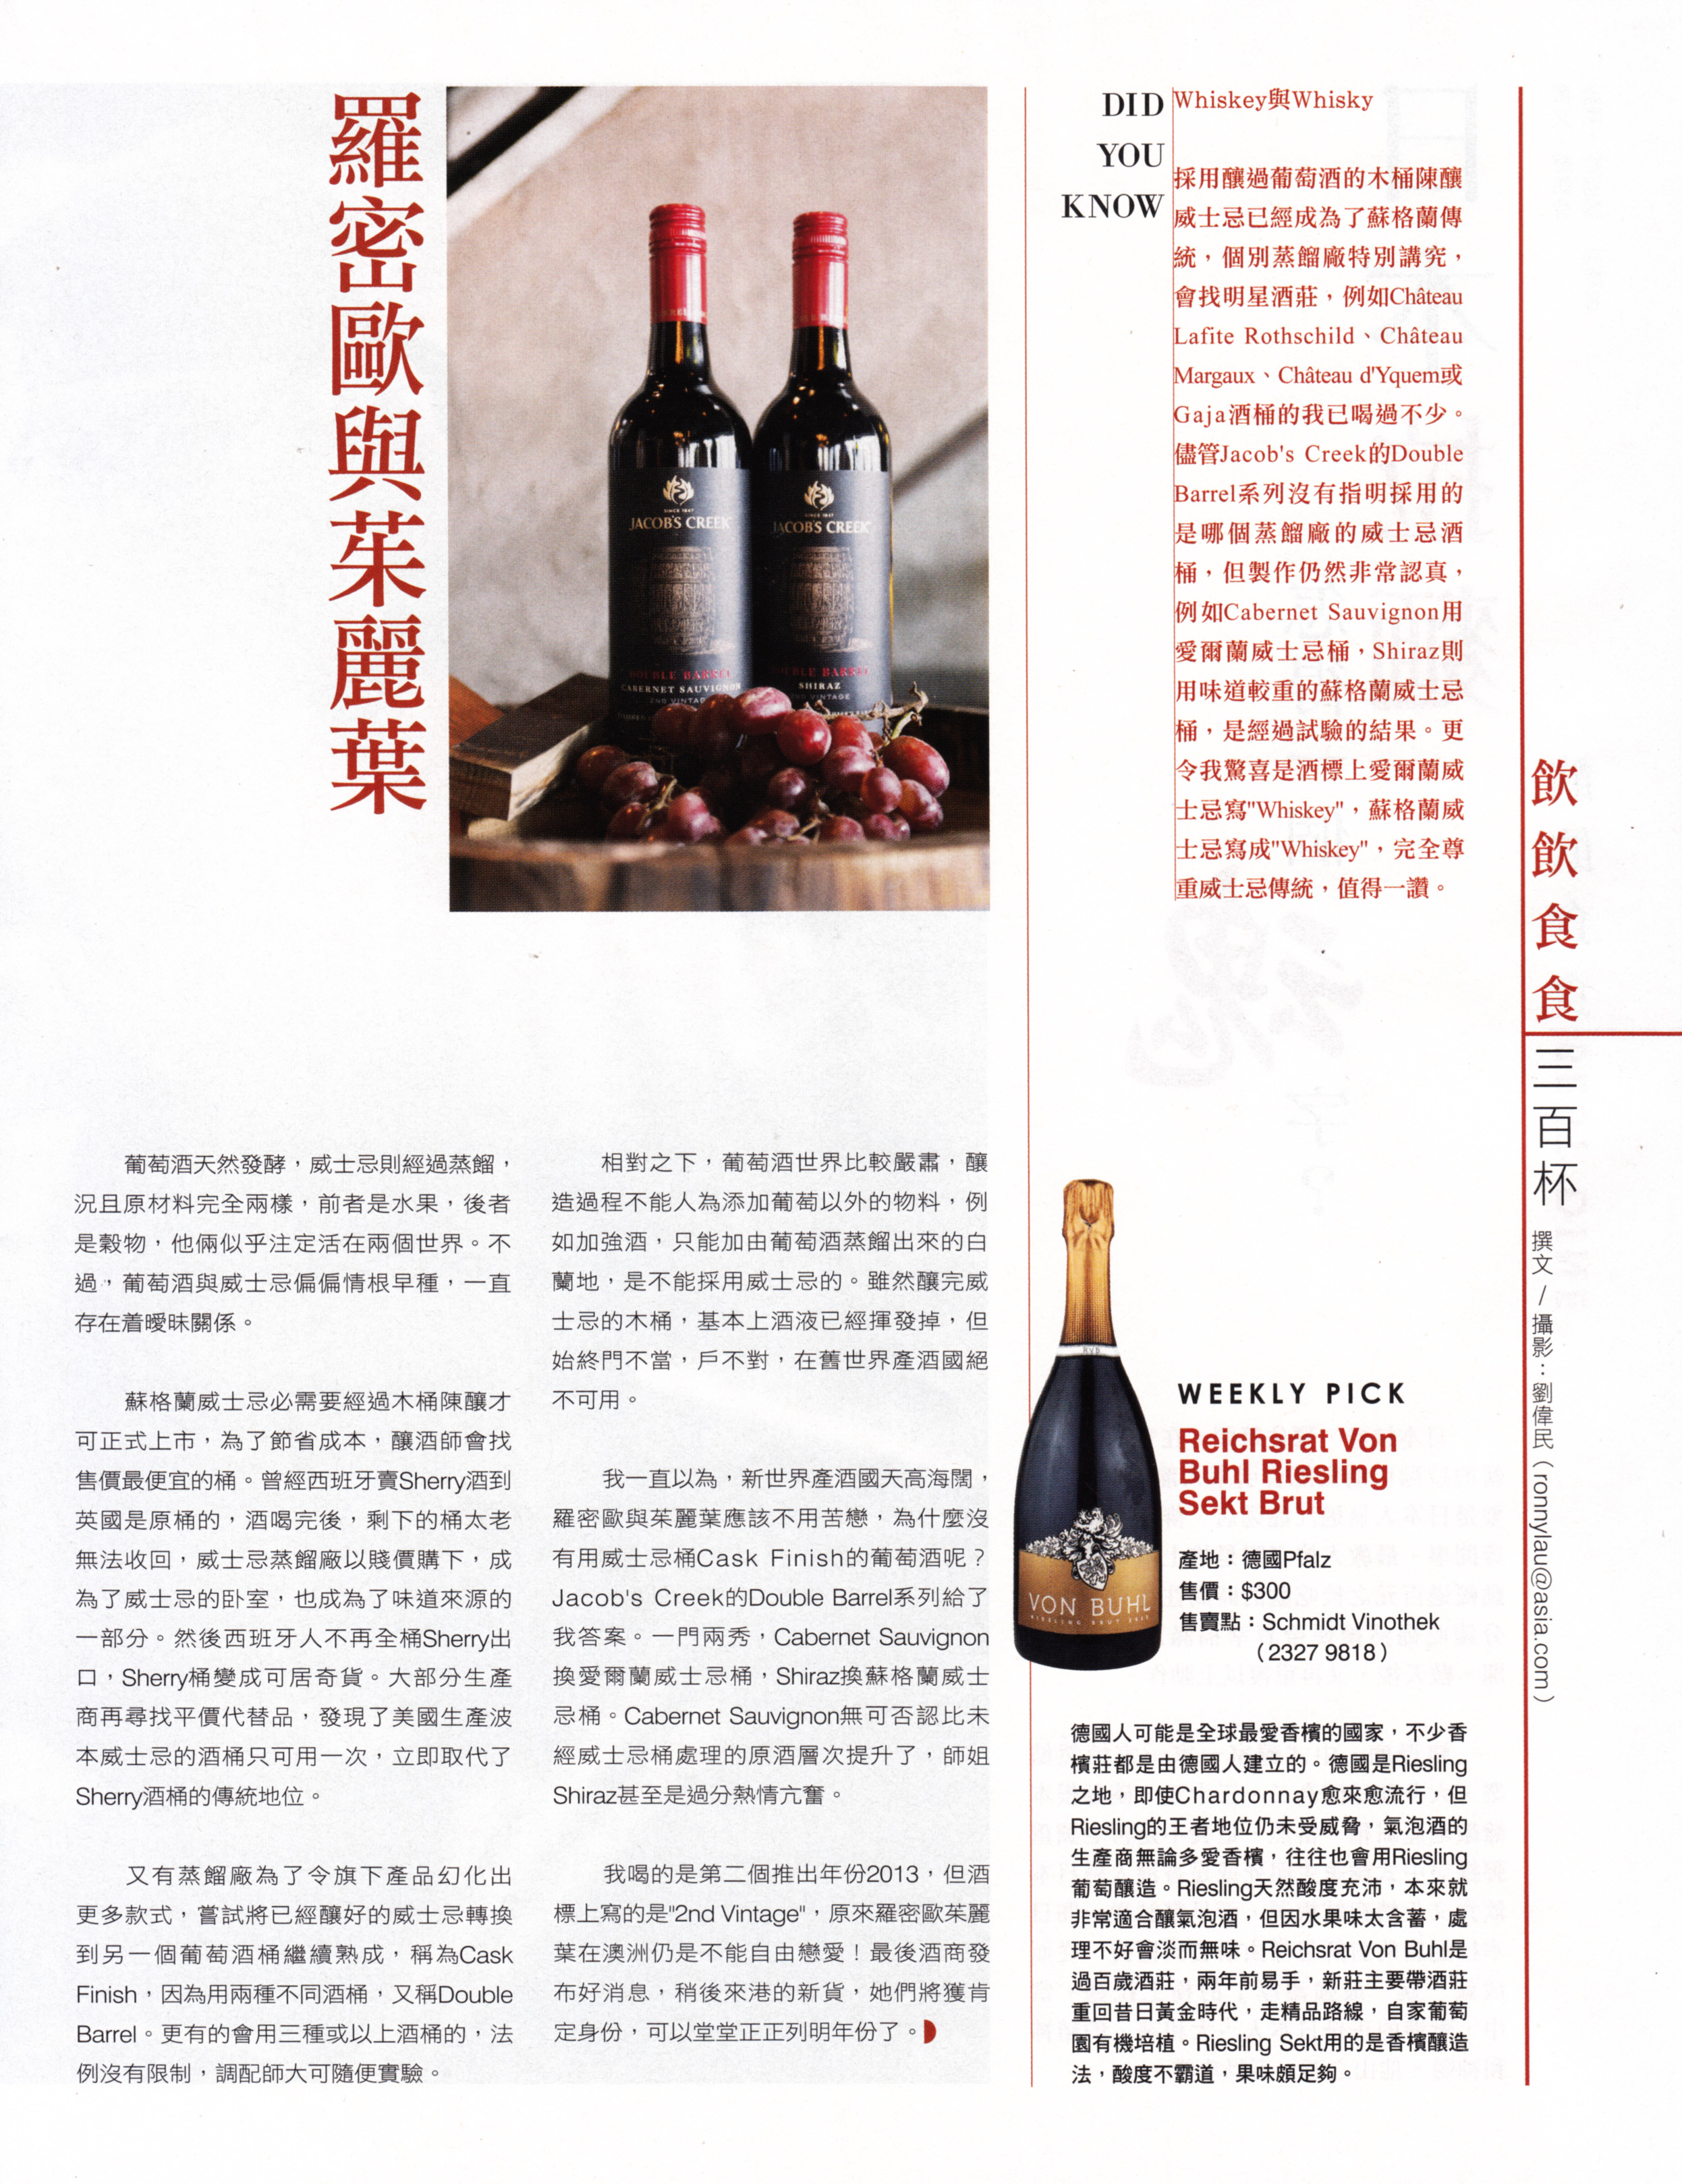 2015-10-24_Ming Pao Weekly.jpg